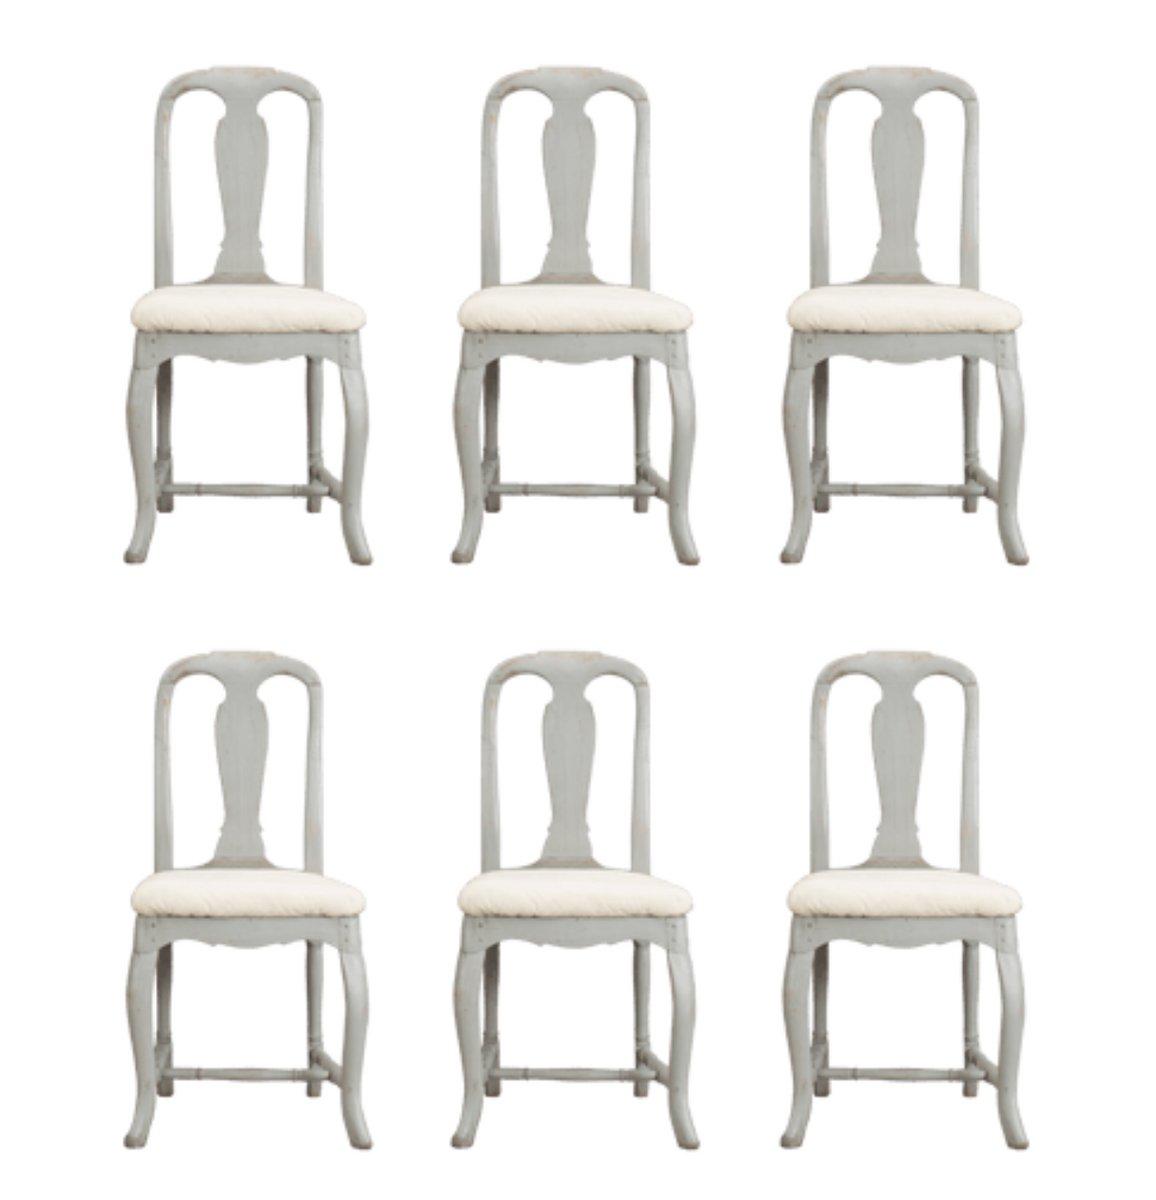 Antike Rokoko Stühle 6er Set 1750 Bei Pamono Kaufen